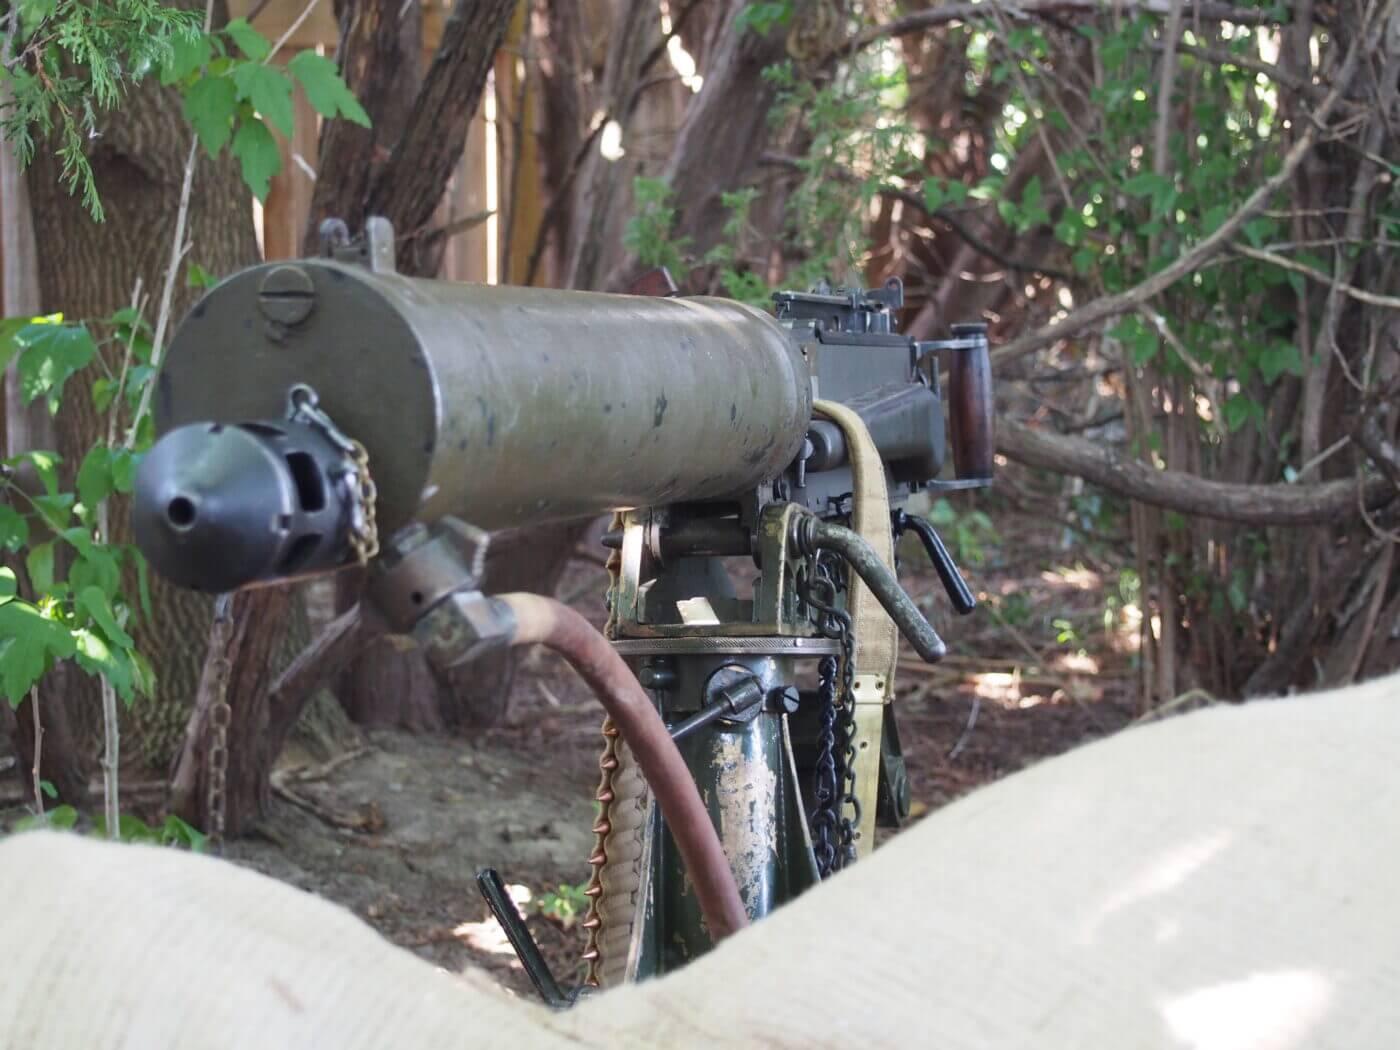 Front view of Vickers machine gun